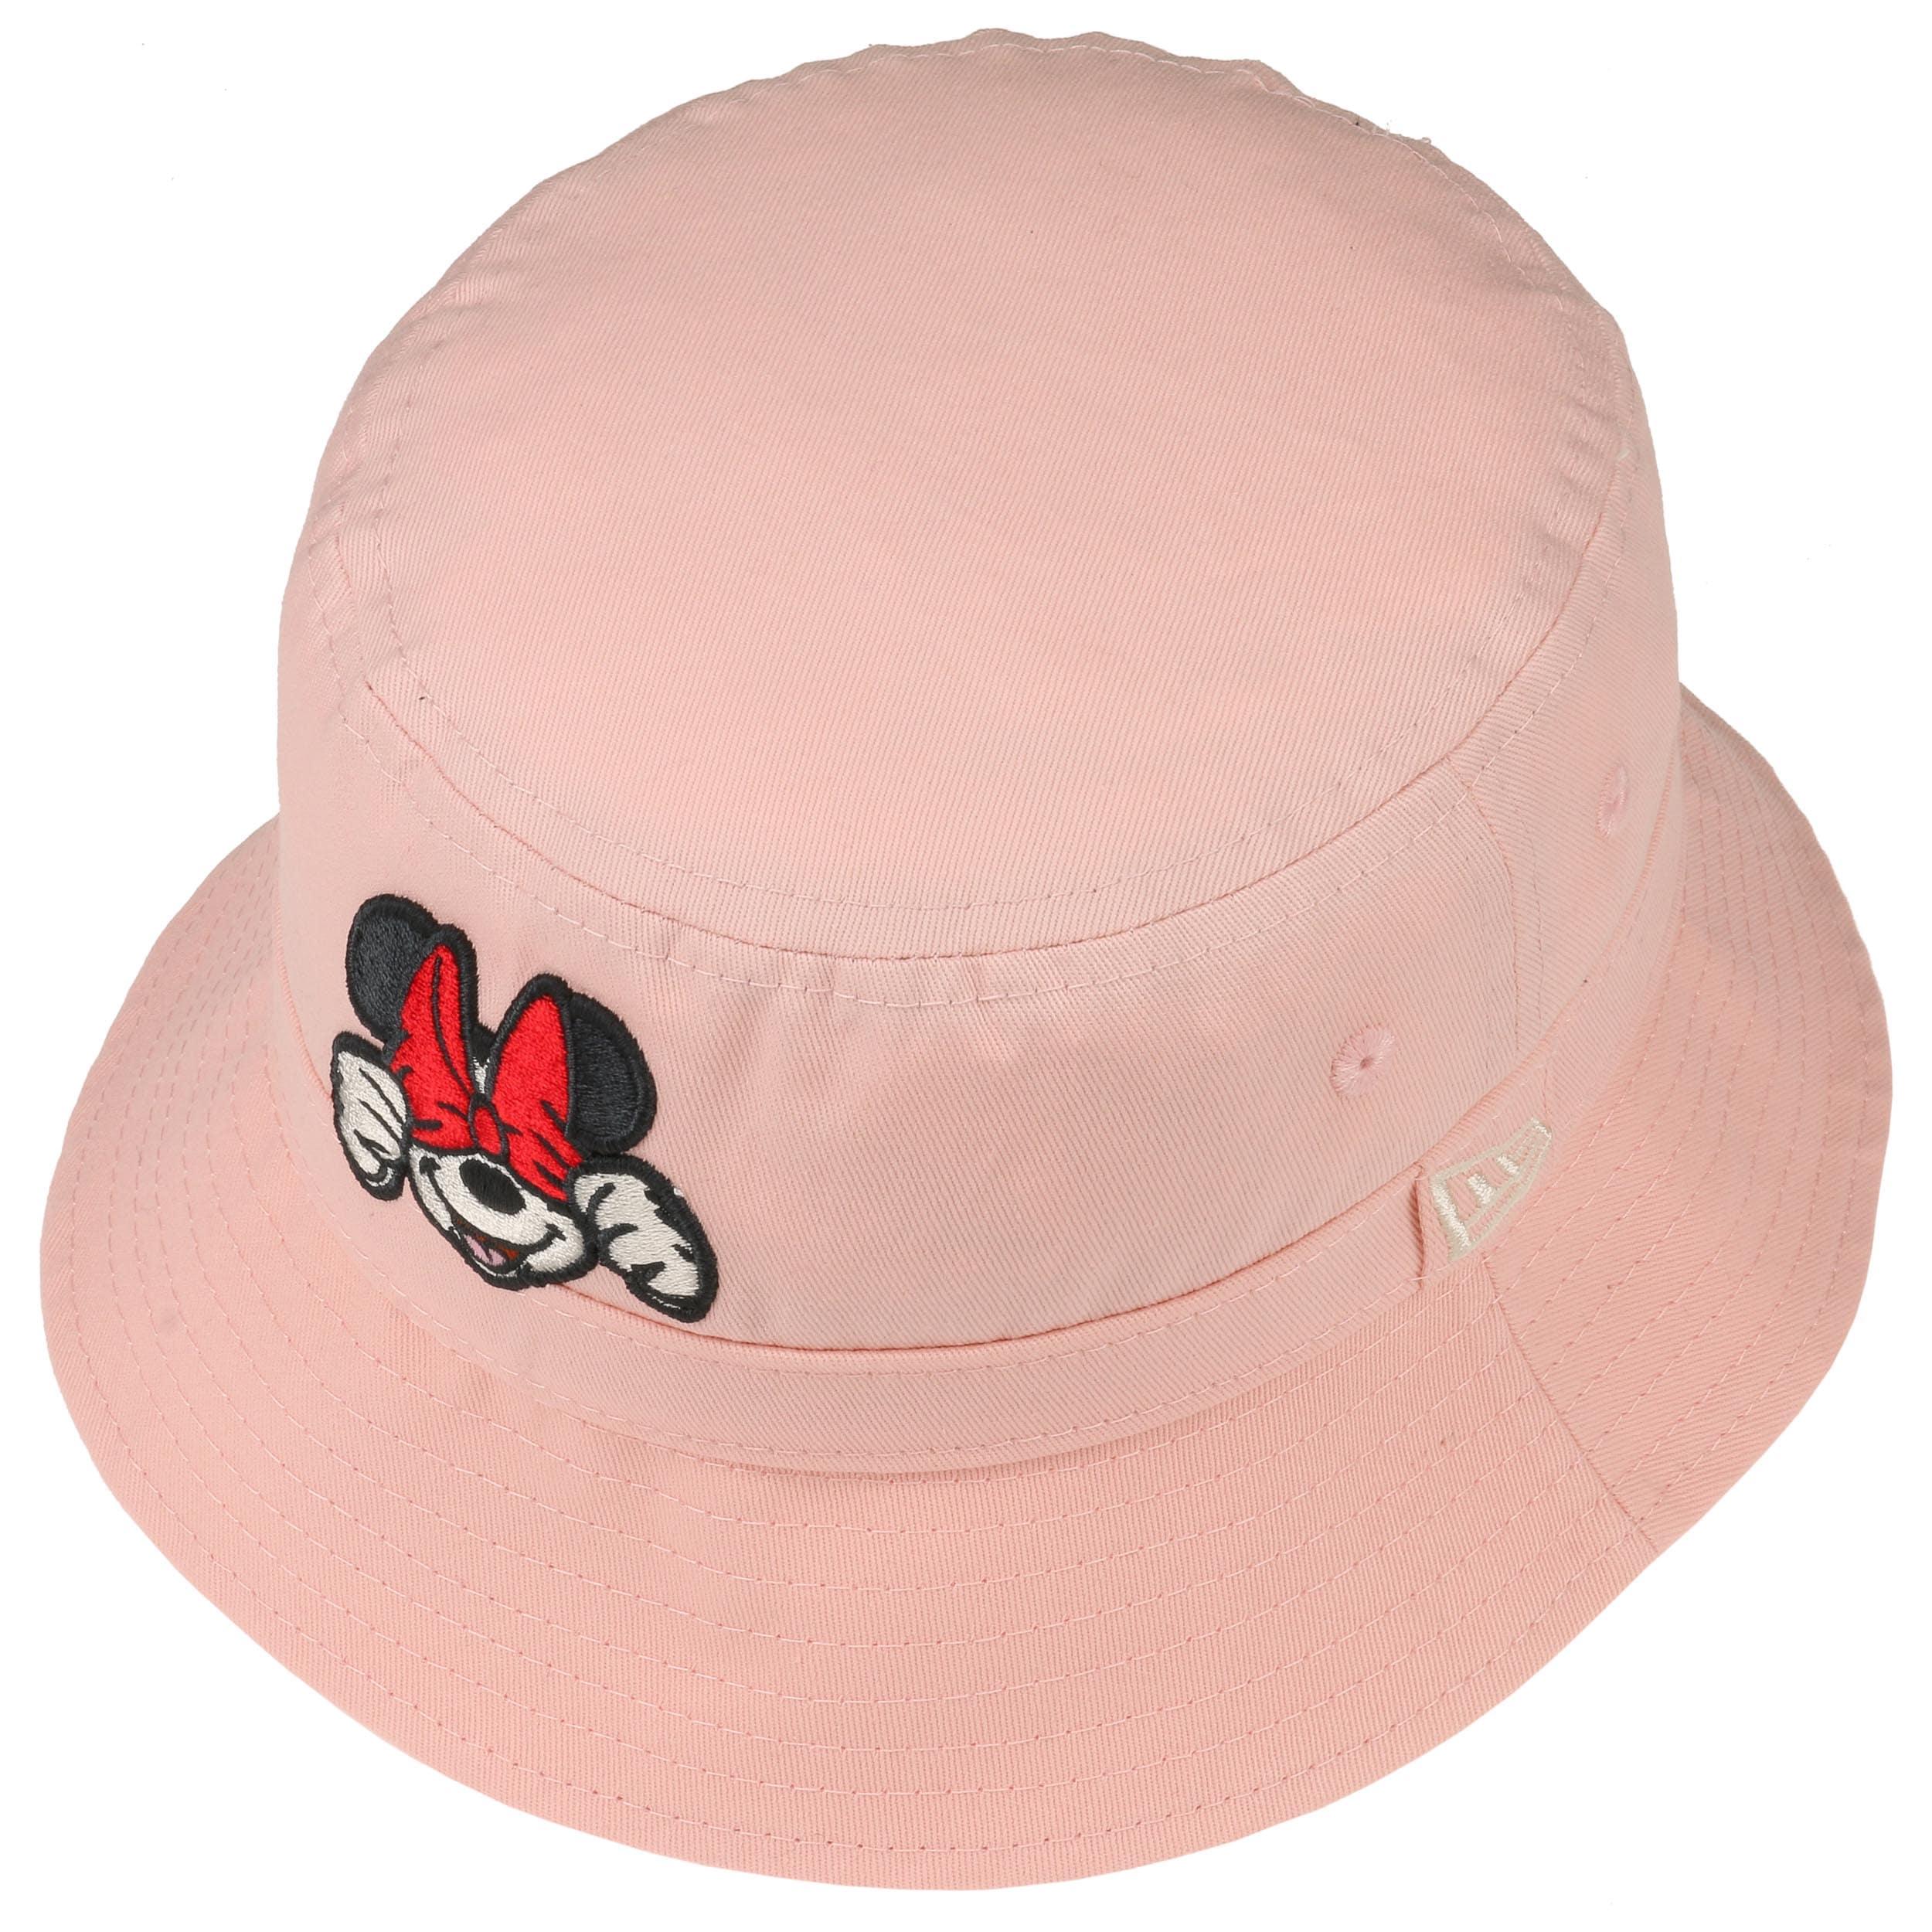 abdf069c0f1 Minnie Mouse Kids Bucket Hat by New Era - pink 1 ...